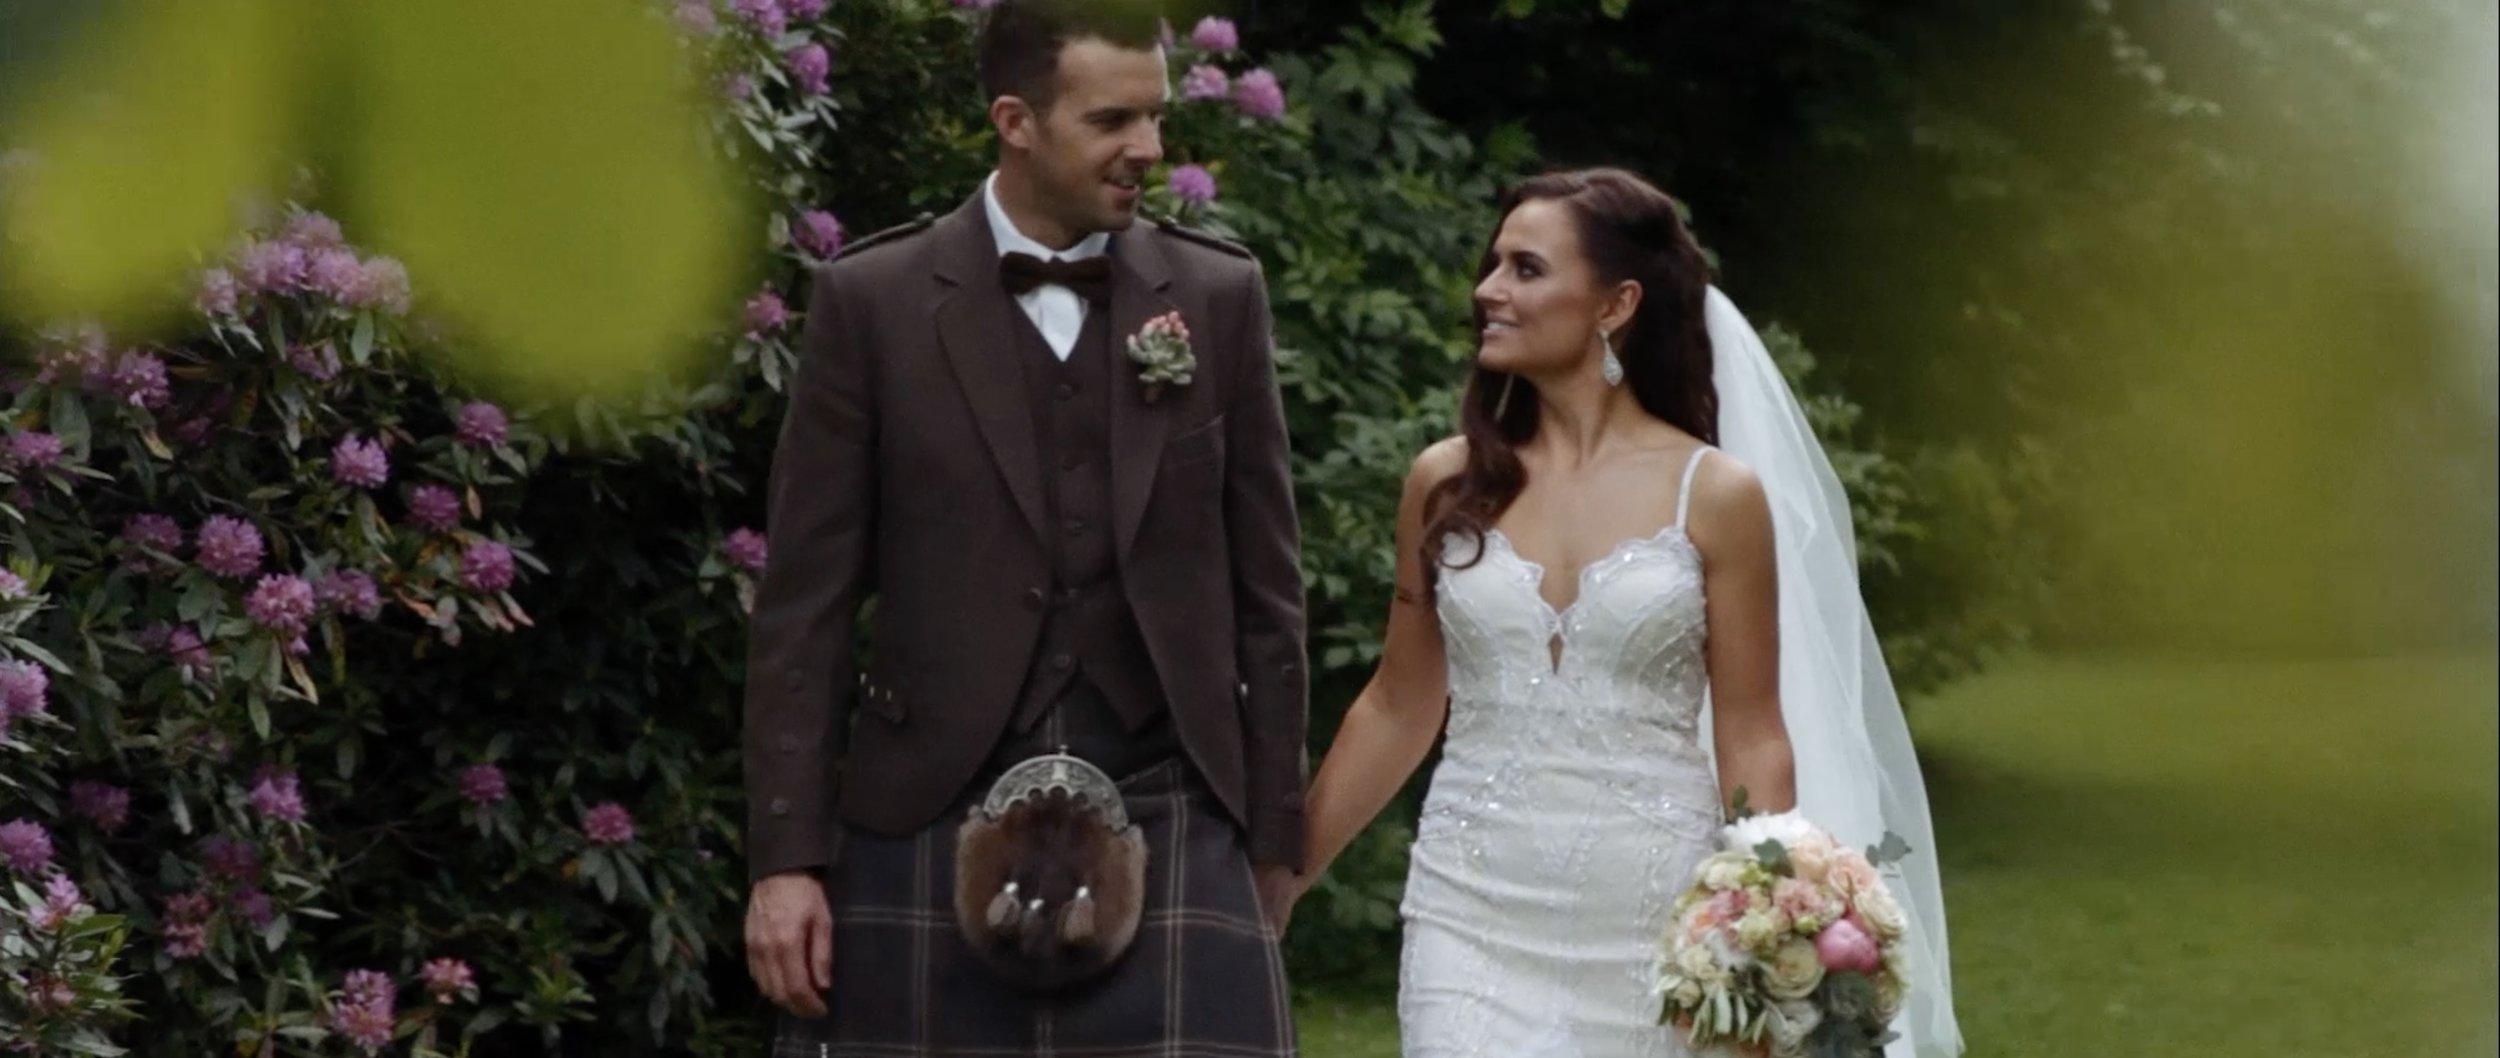 perth-wedding-videographer_LL_06.jpg